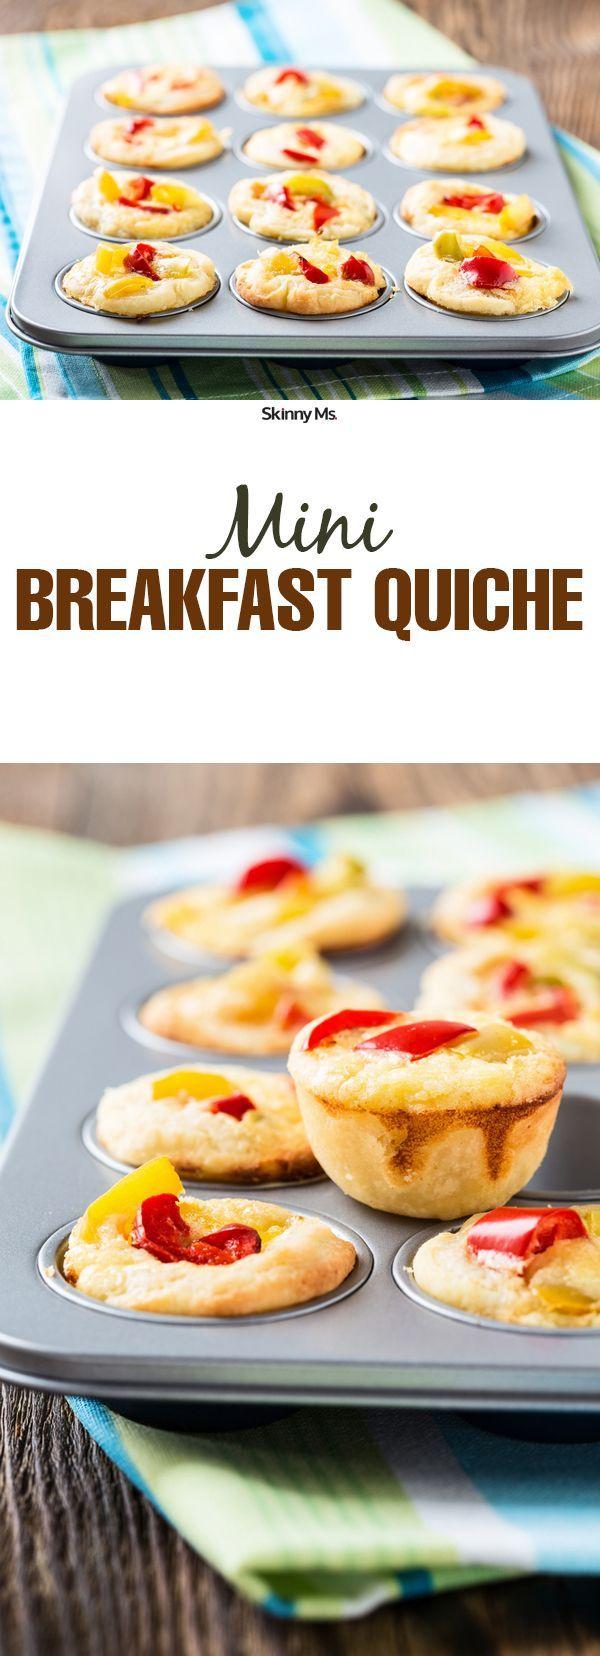 A delicious way to start the day--Mini Breakfast Quiche!